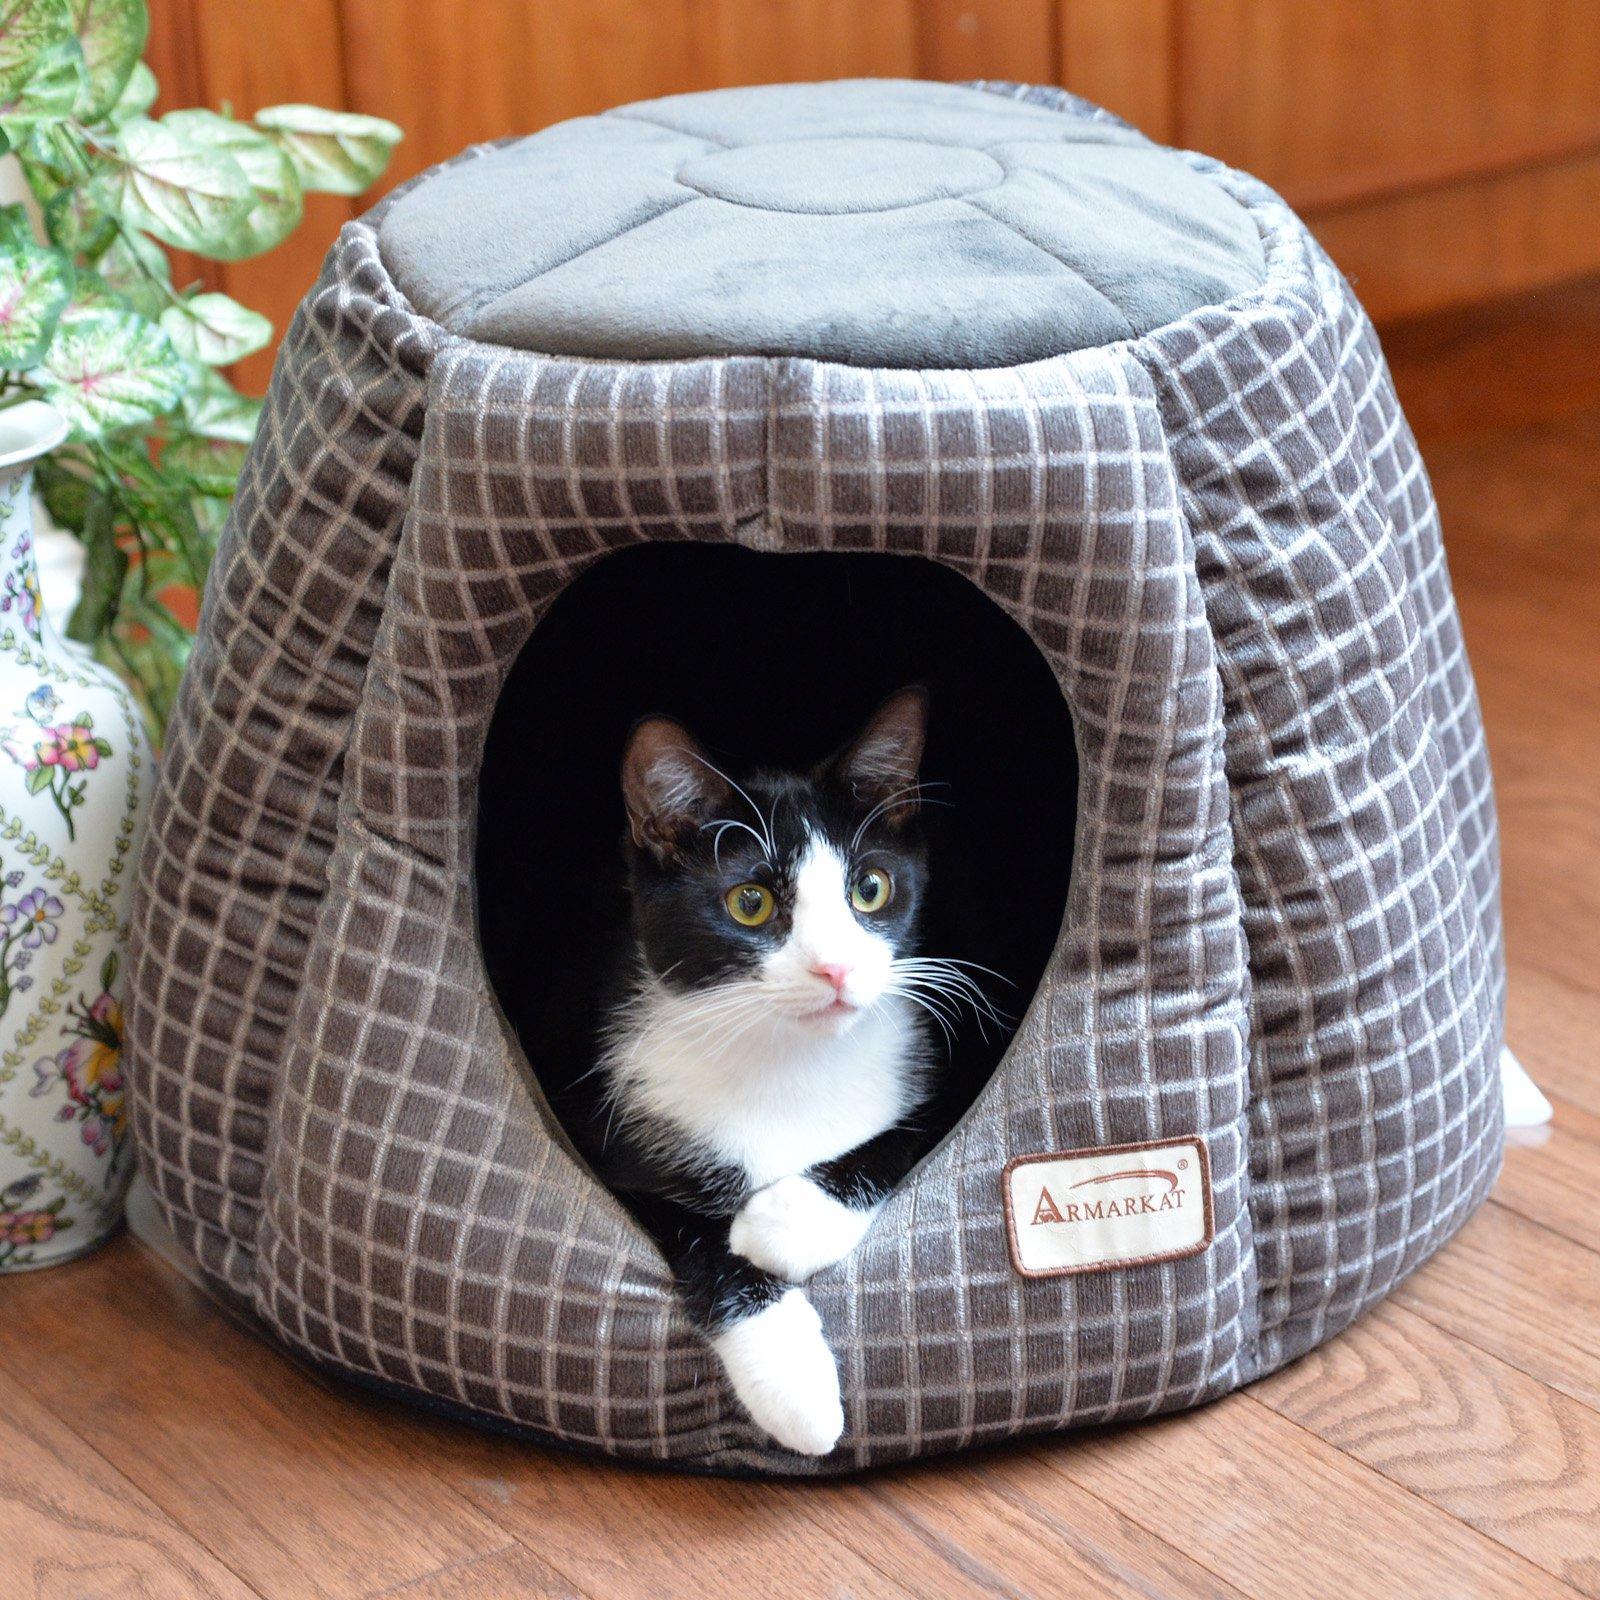 Armarkat Cat Bed C30HHG/SH